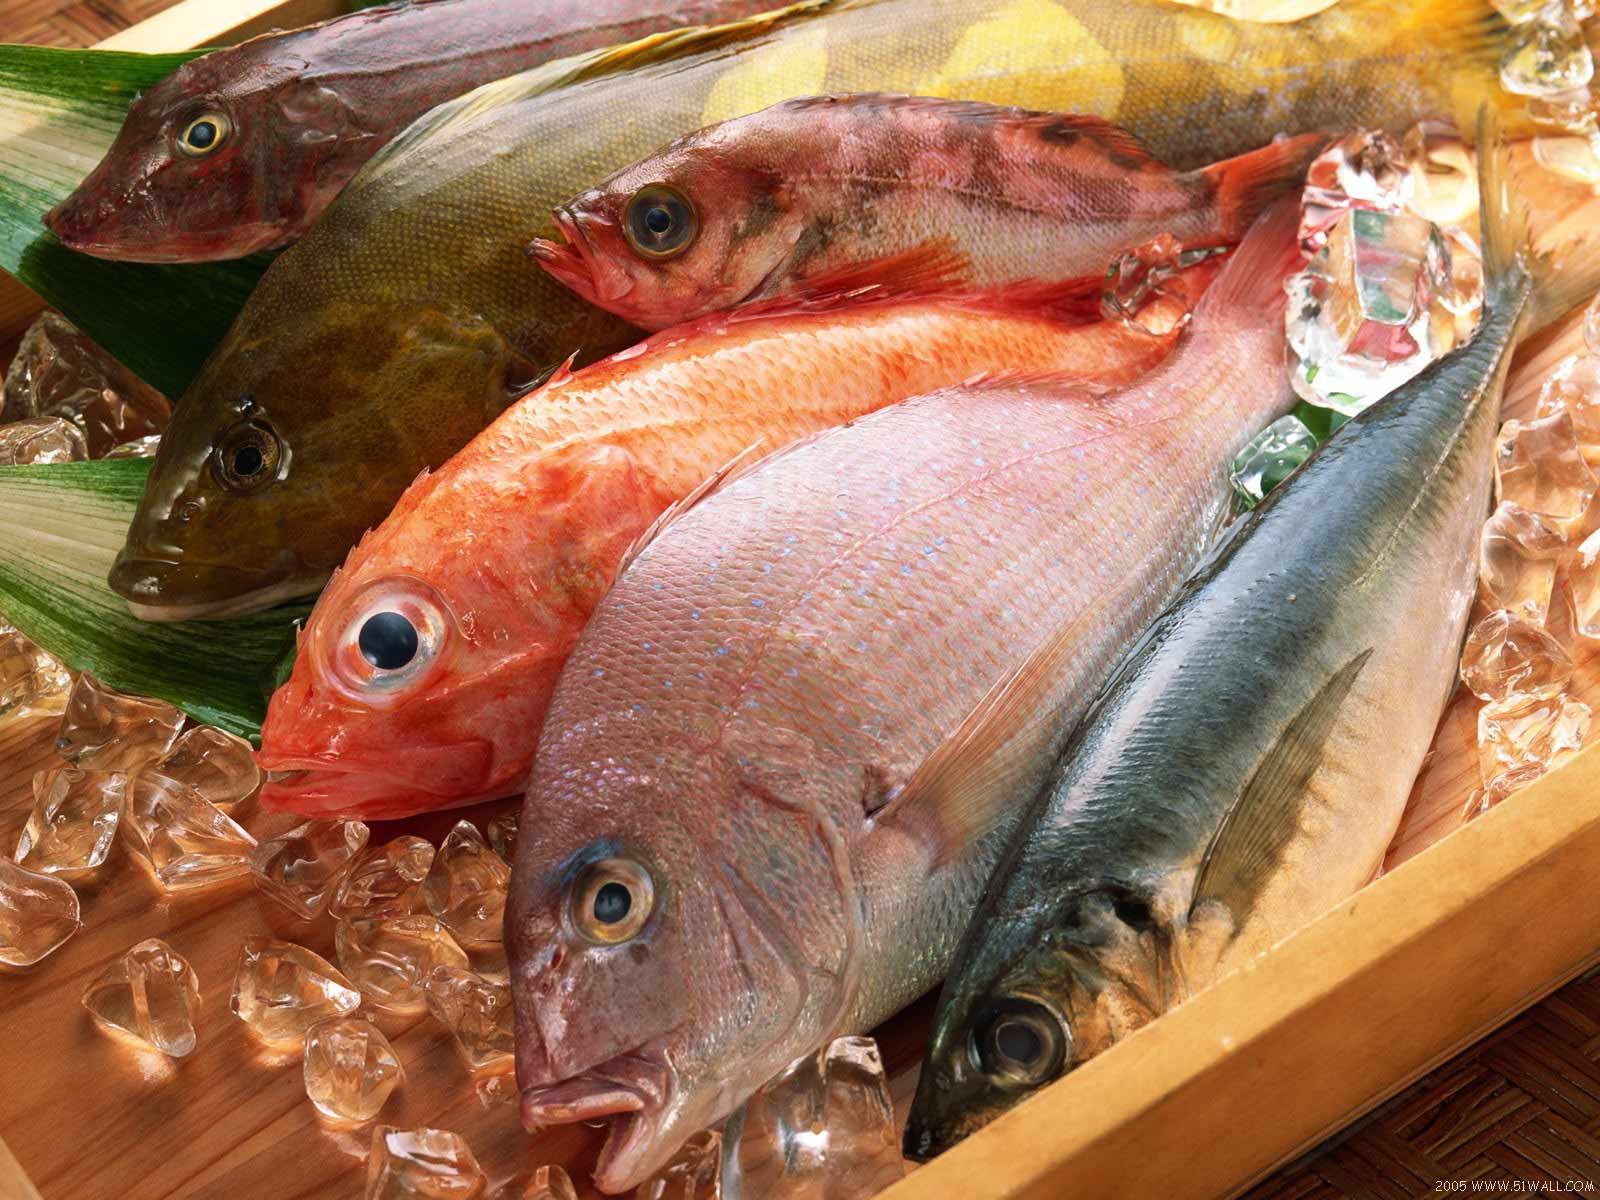 http://4.bp.blogspot.com/-Ljxhnk-lE2U/UN8SMvdvfoI/AAAAAAAAHY0/tYsUFSwIXPw/s1600/Fish-Marketplace.jpg